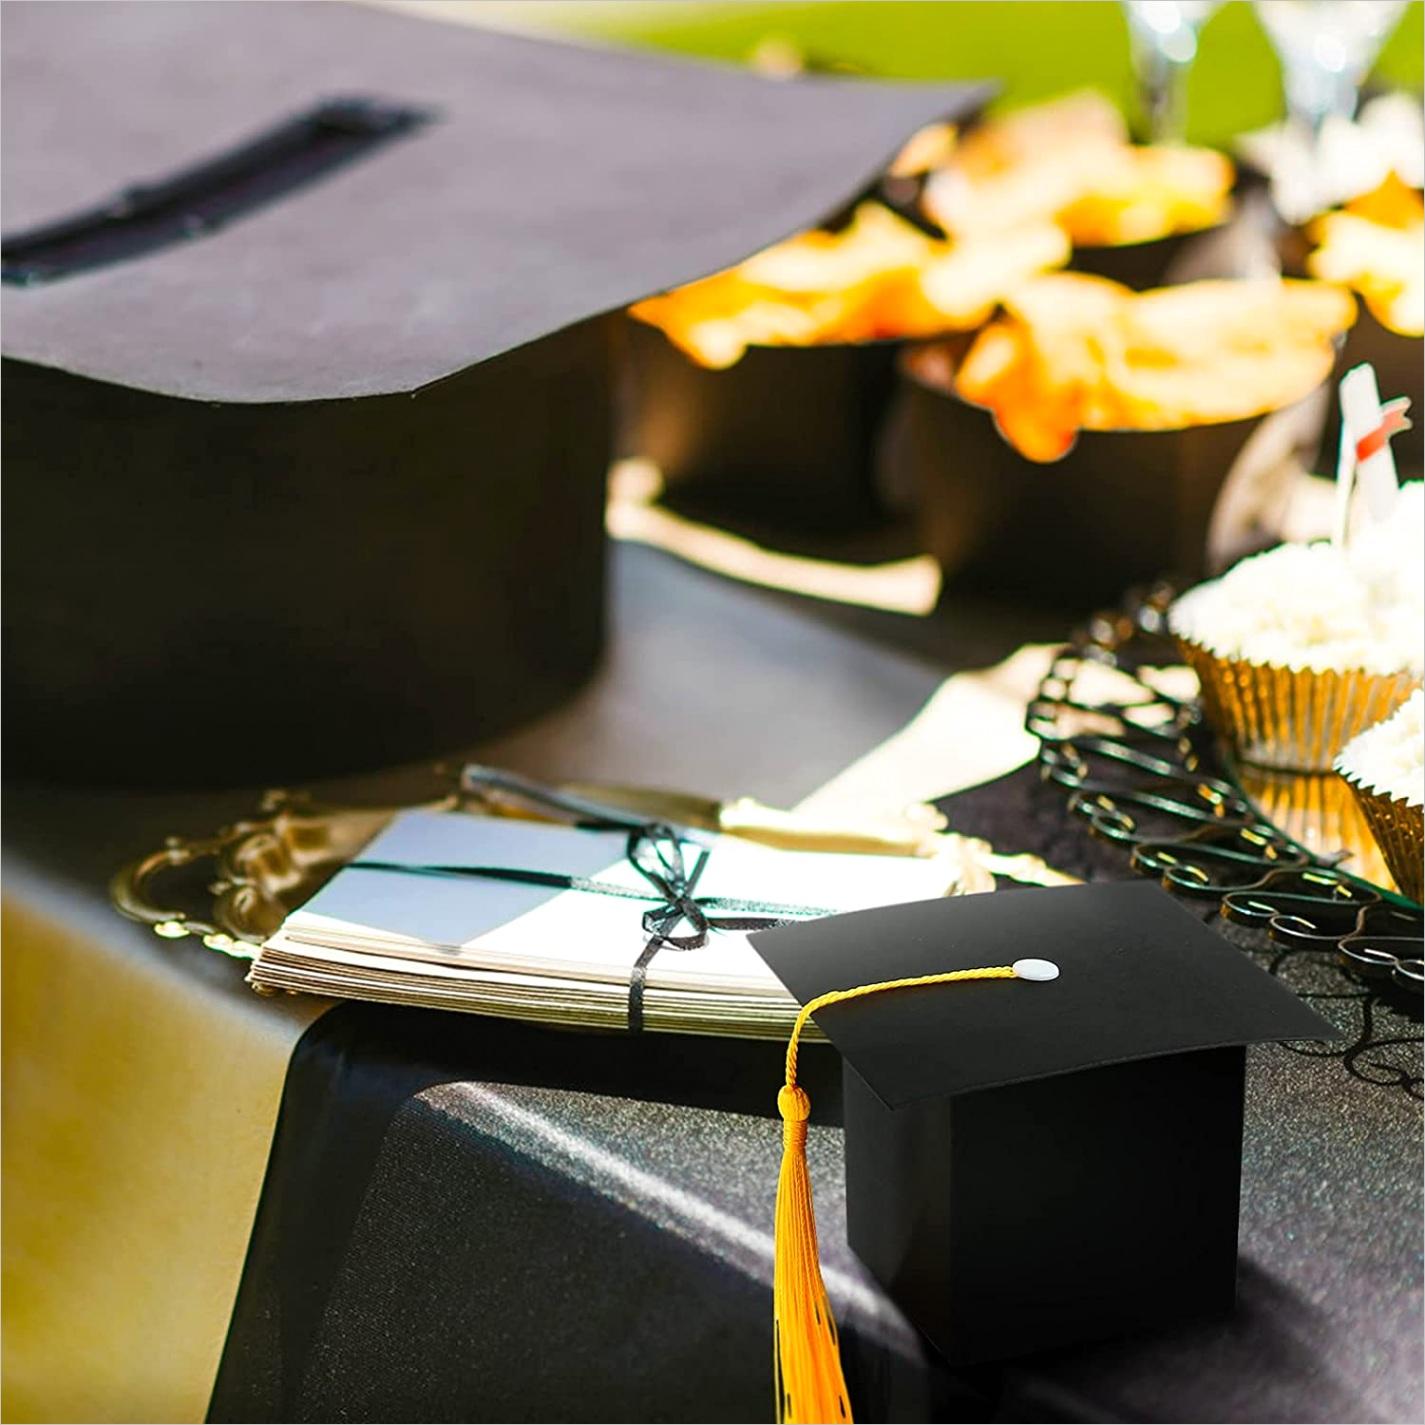 1AEQ1EB5W graduation party favors 2021 24 pack graduation favor boxes grad cap box for candy goody chocolate t graduation party supplies